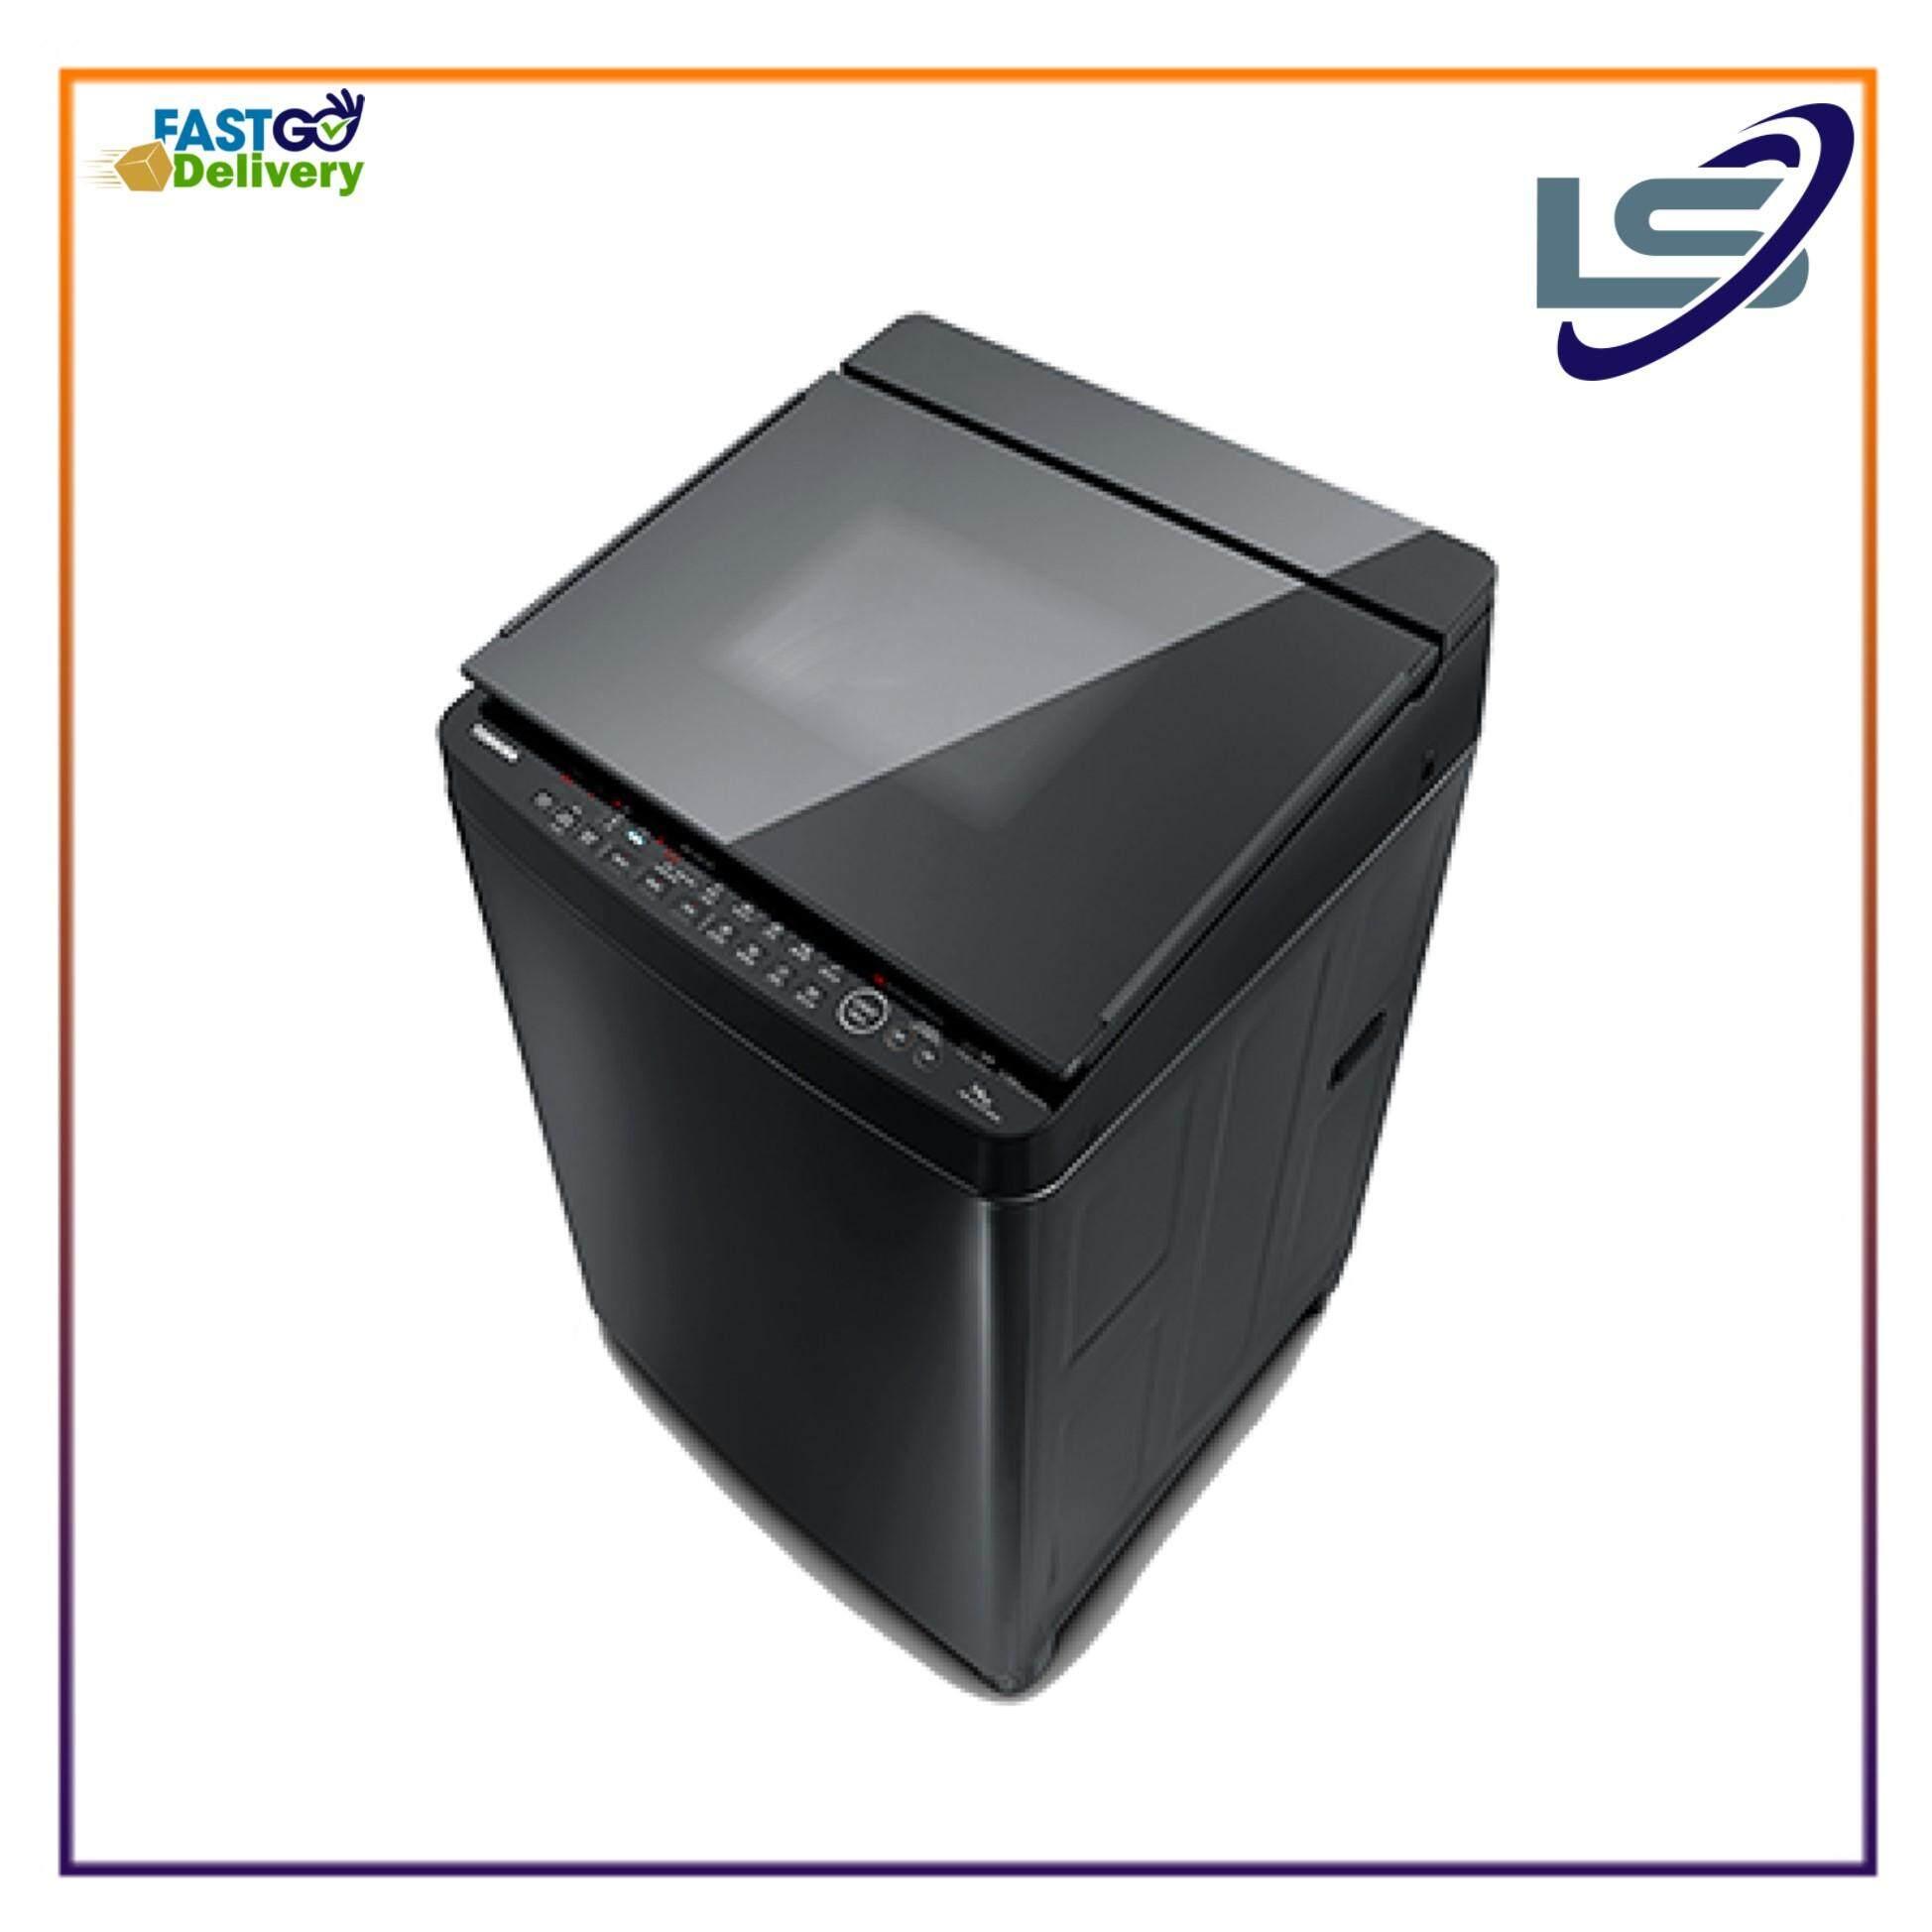 Toshiba14kg SDD-Inverter Fully Automatic Washing Machine AW-DG1500WM